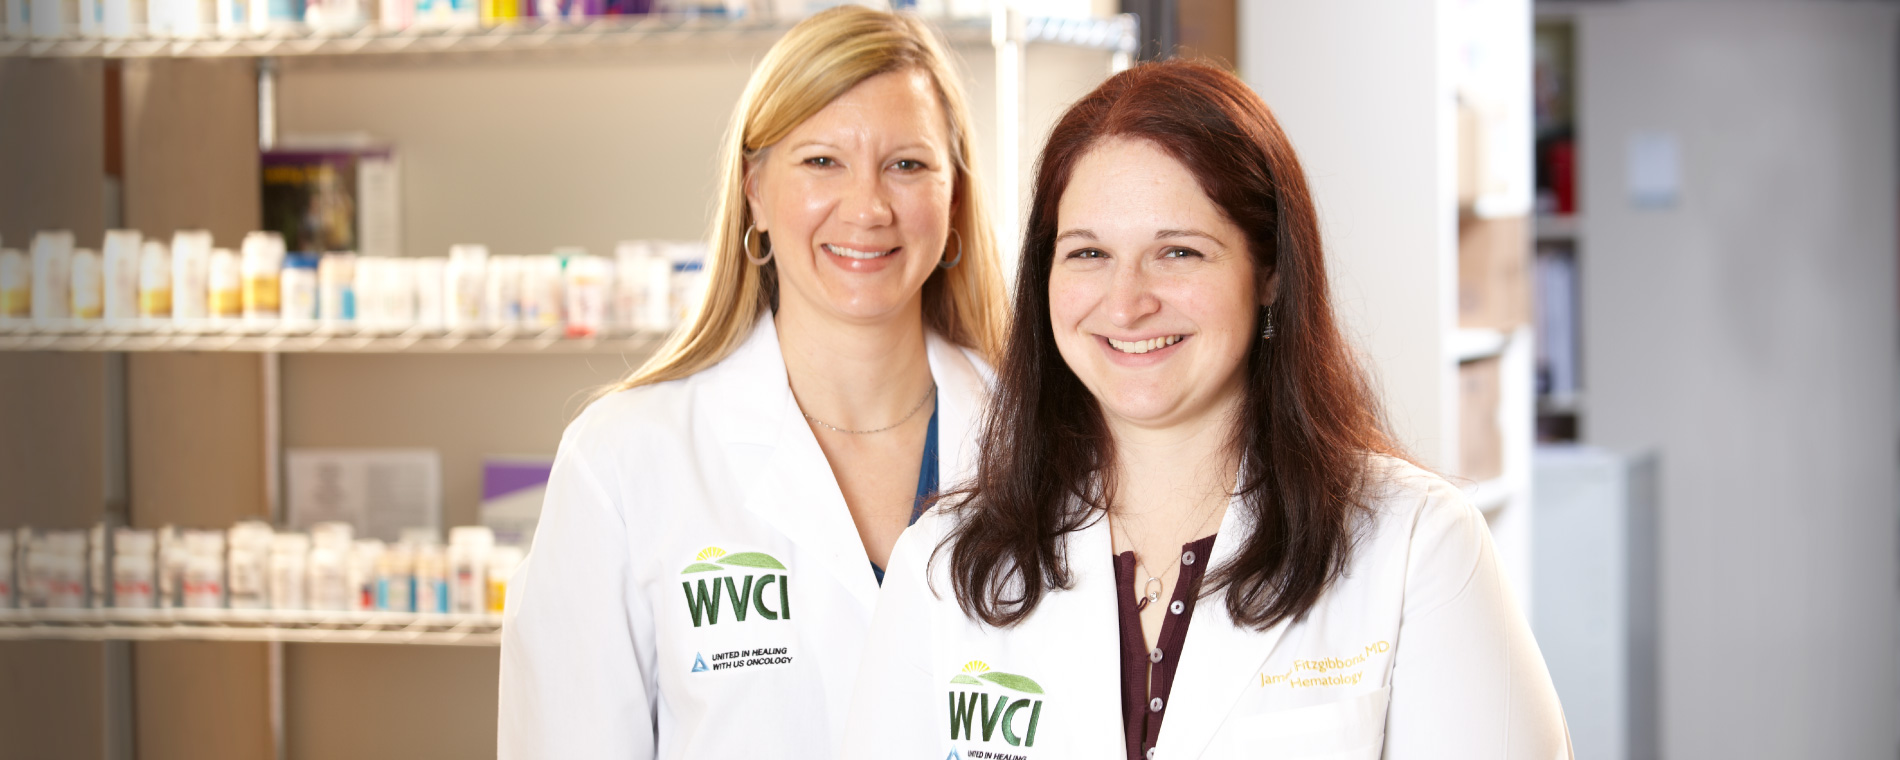 WVCI_patients_pharmacy